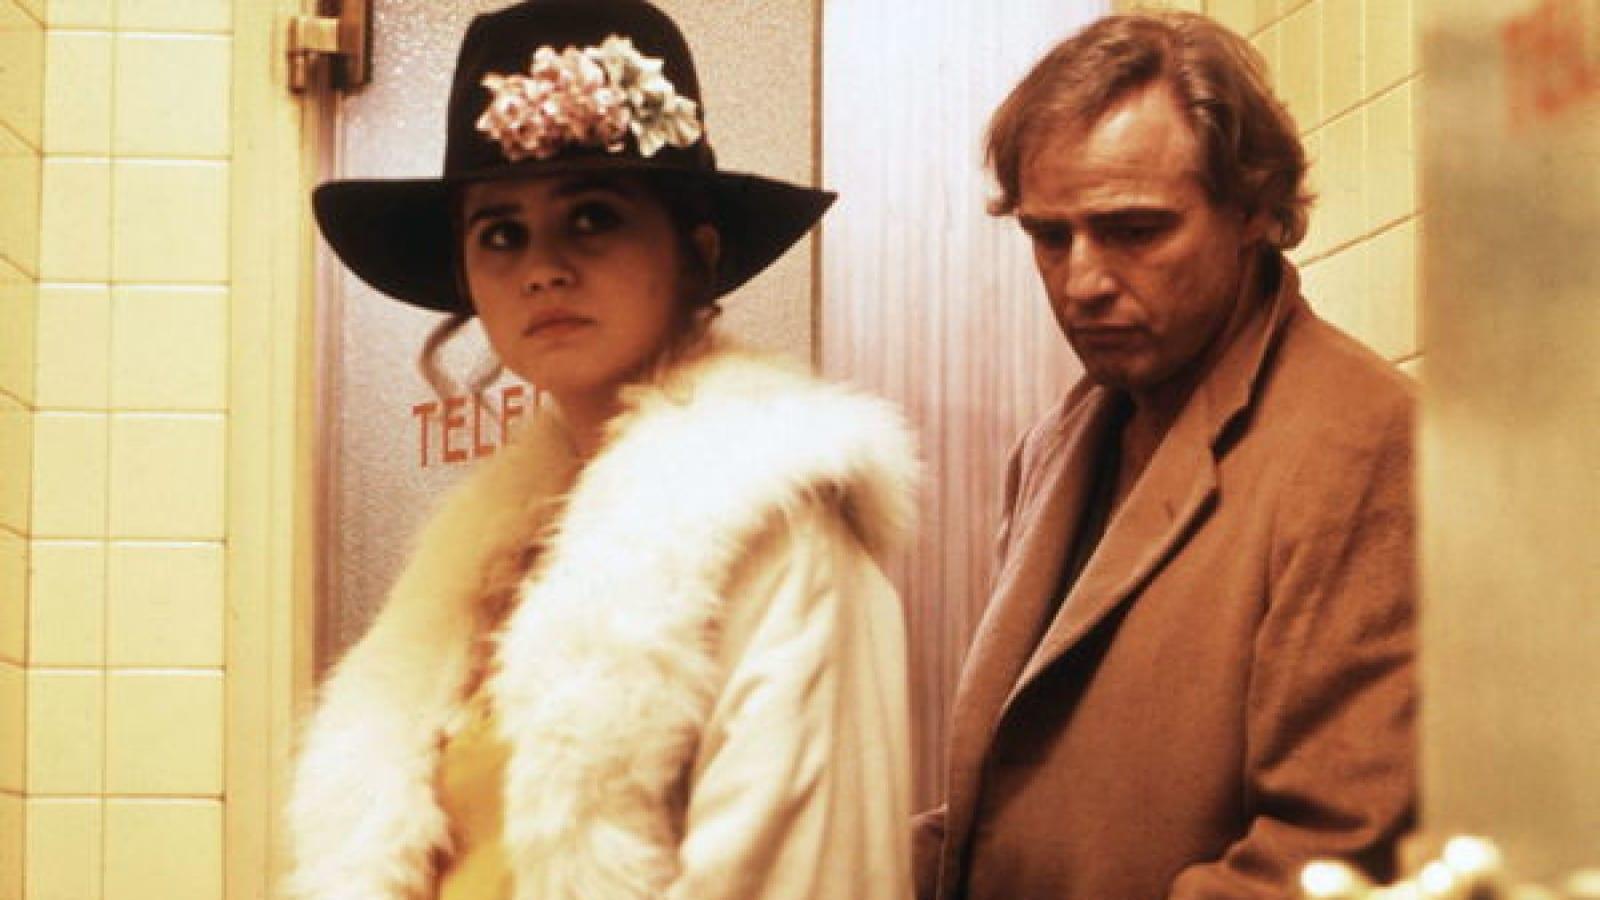 Last Tango In Paris / Ultimo Tango A Parigi (1972) | Pers: Maria Schneider, Marlon Brando | Dir: Bernardo Bertolucci | Ref: LAS053AH | Photo Credit: [ The Kobal Collection / Pea ] |